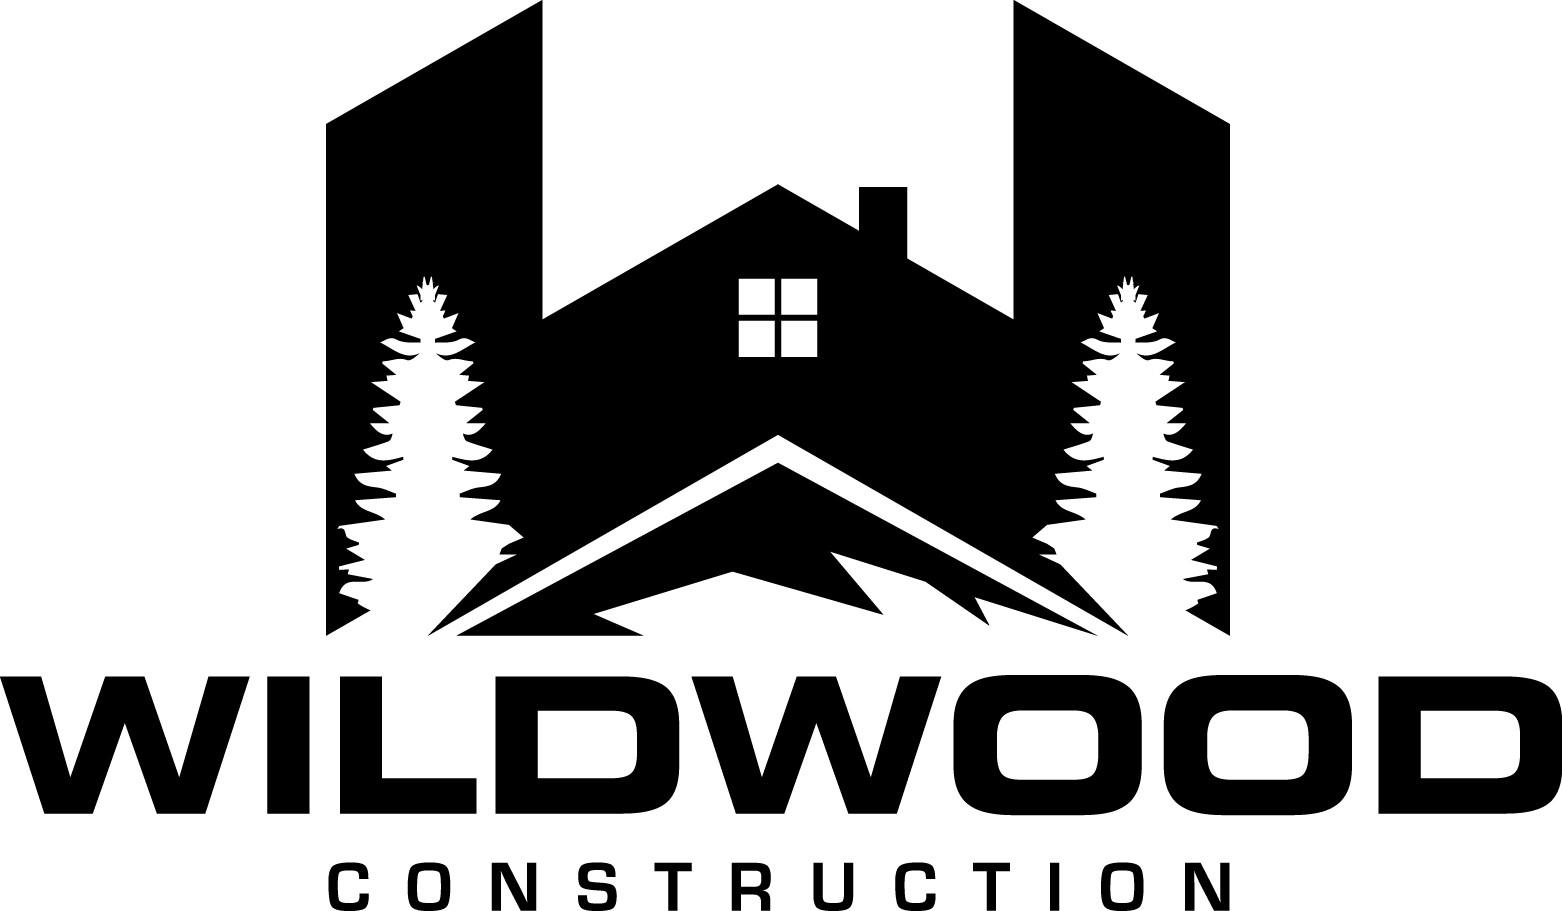 Logo for Wildwood Construction Management based in WV